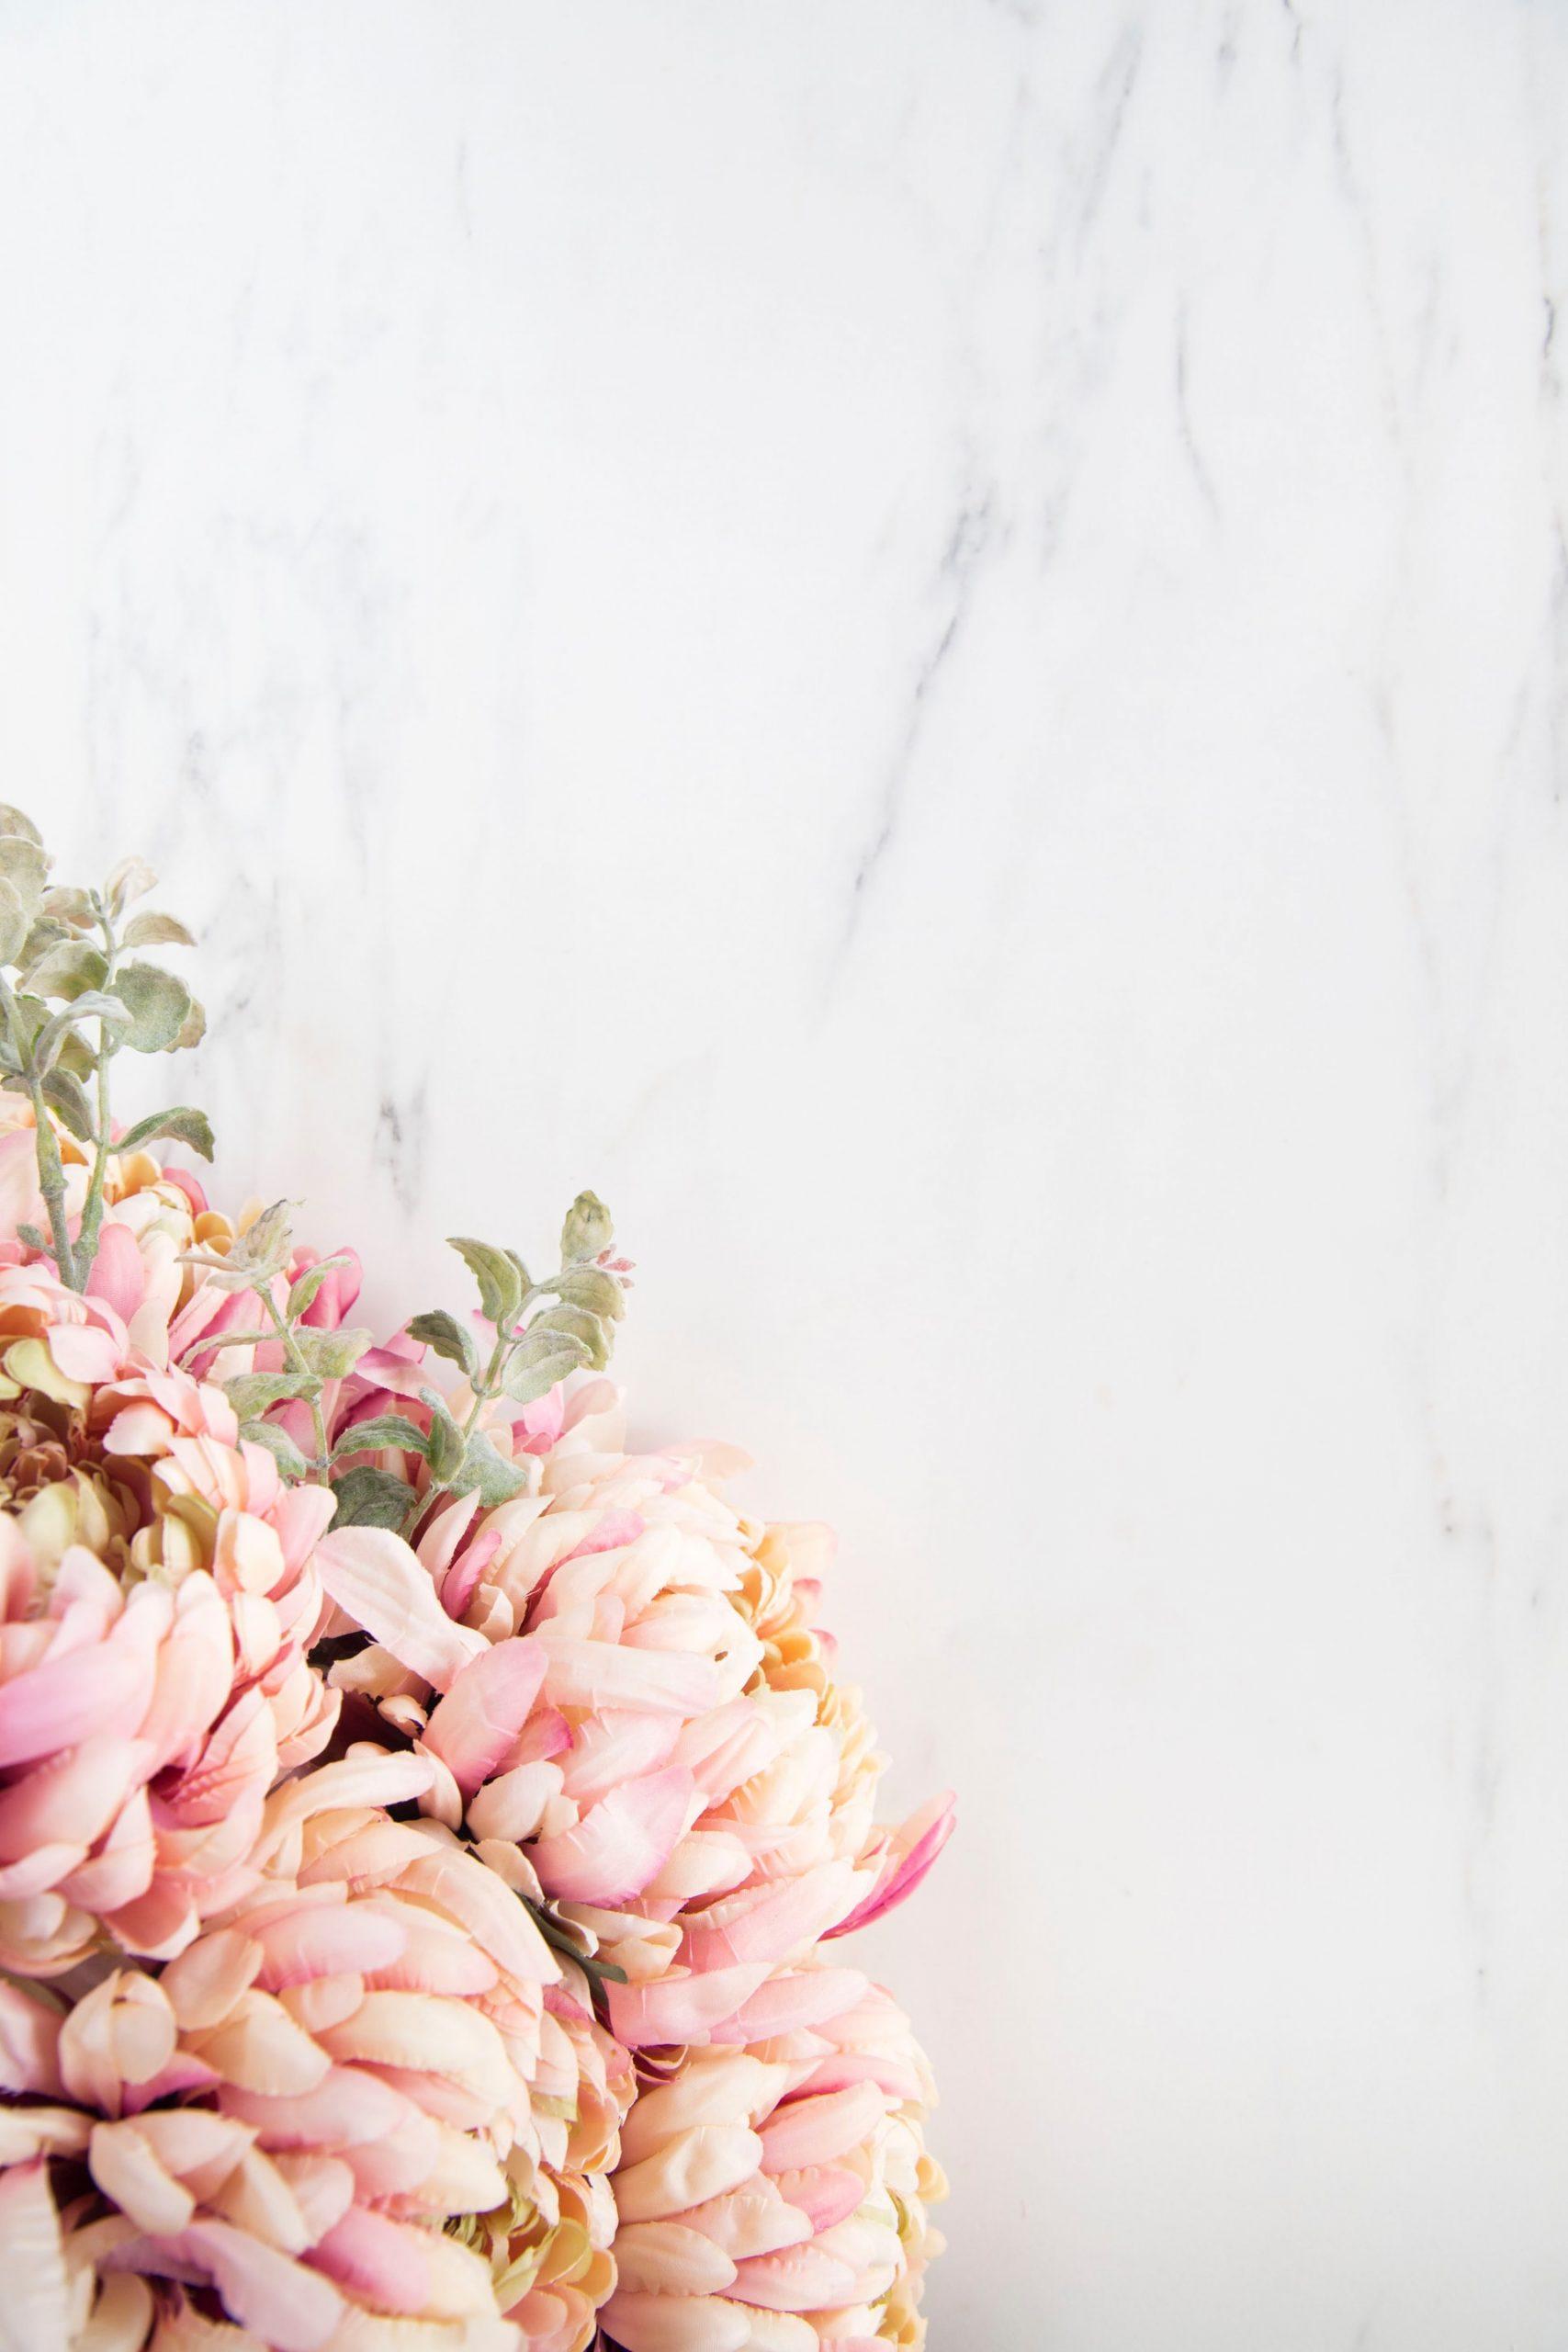 essential oils made from flower petals